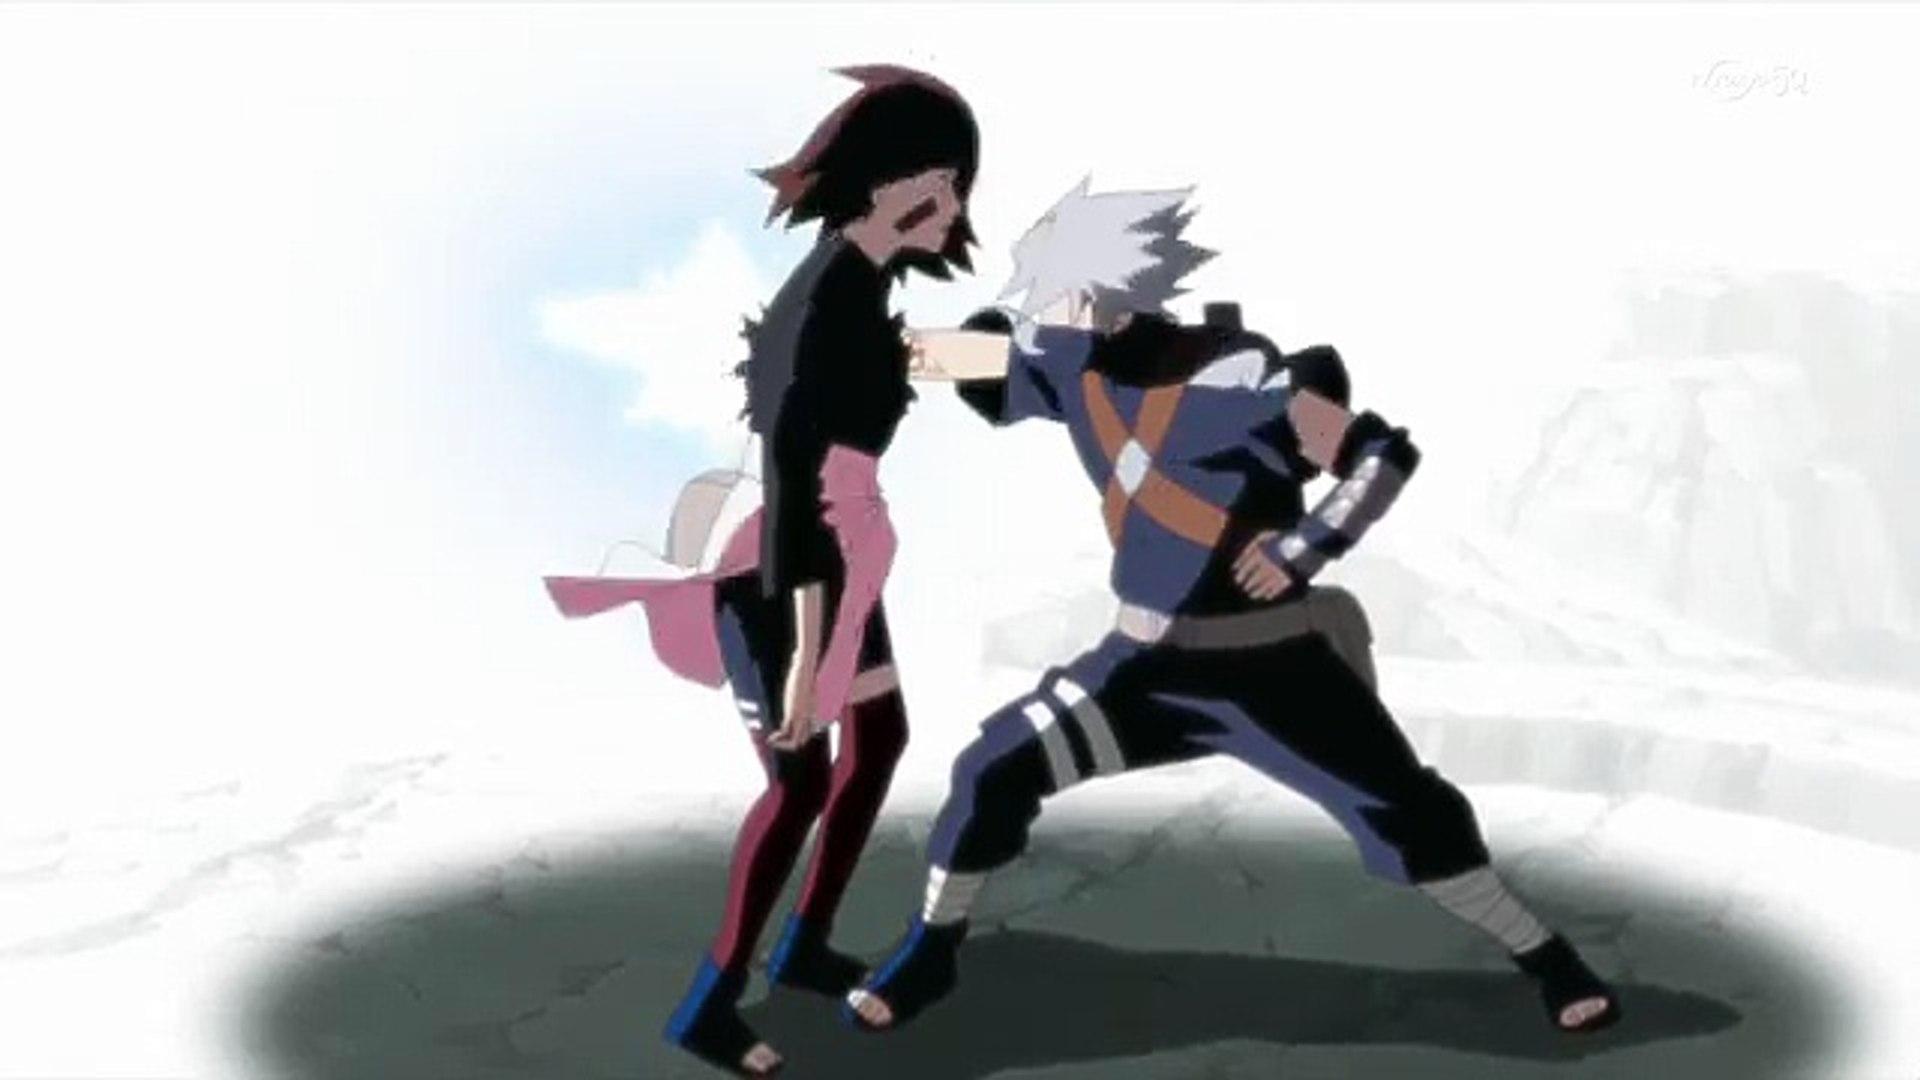 Naruto カカシ オビト 万華鏡写輪眼開眼の瞬間 Video Dailymotion